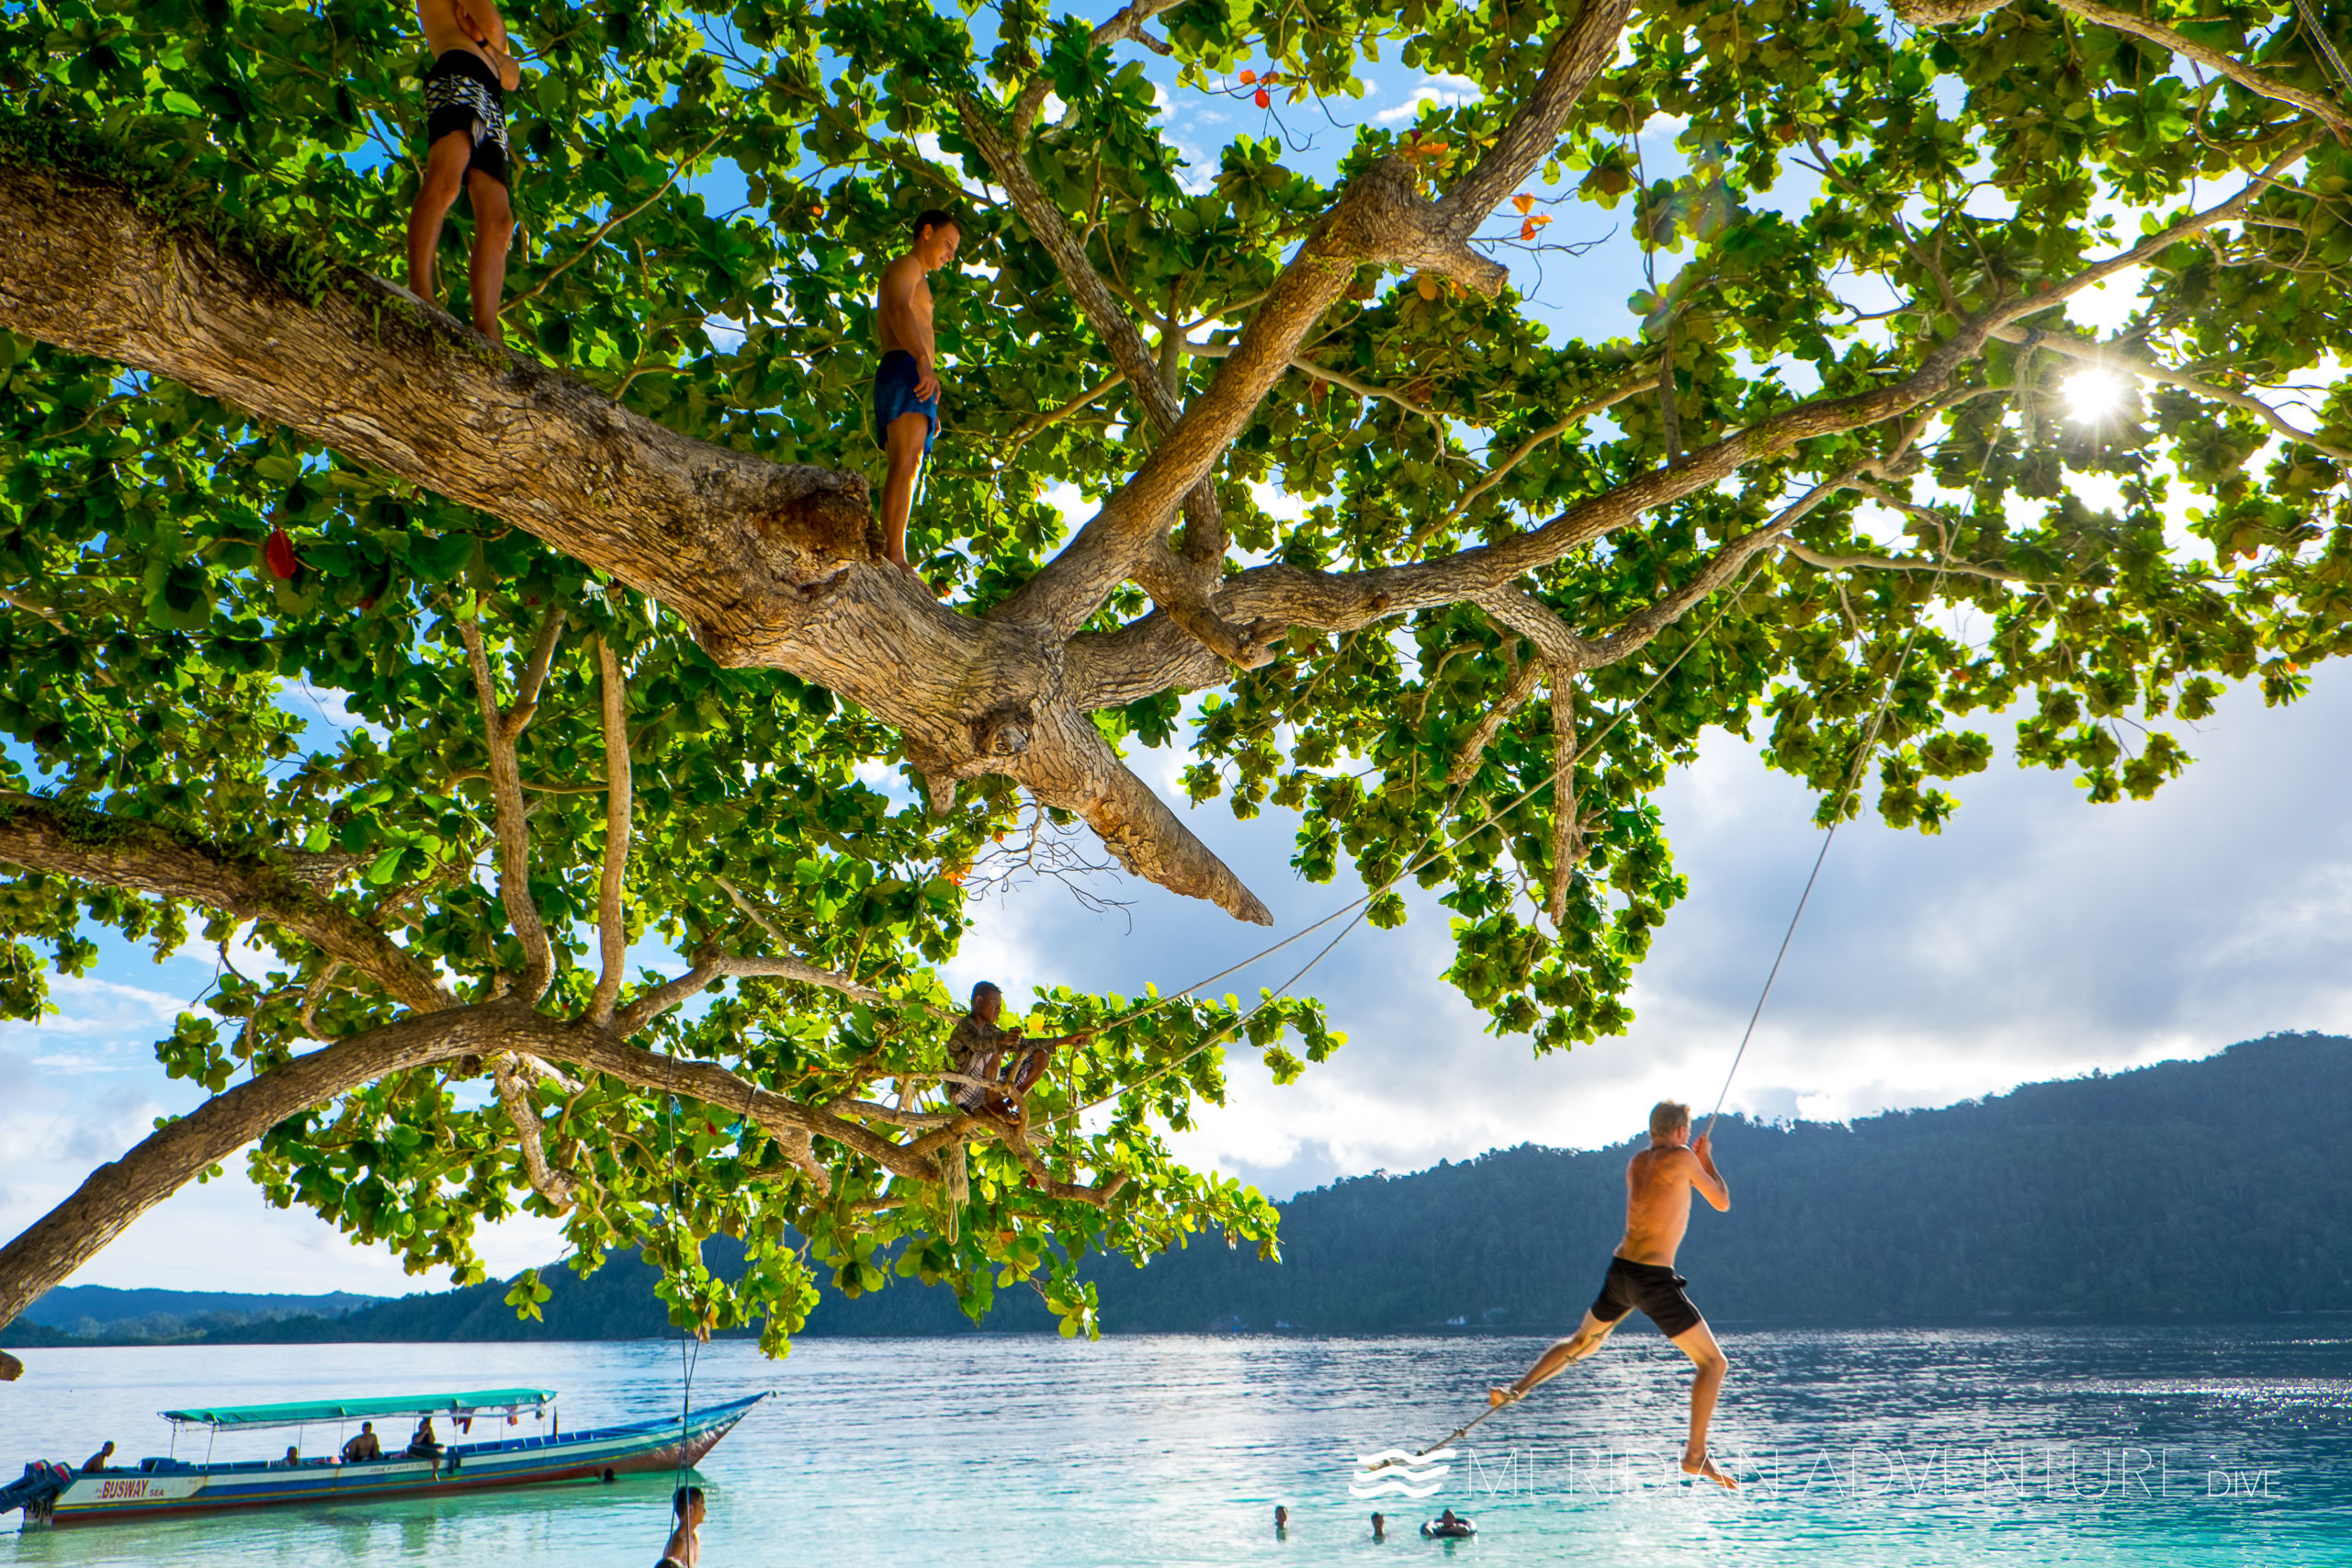 Meridian Adventure Dive Bring you Homestay Experiences to Dive Raja Ampat!